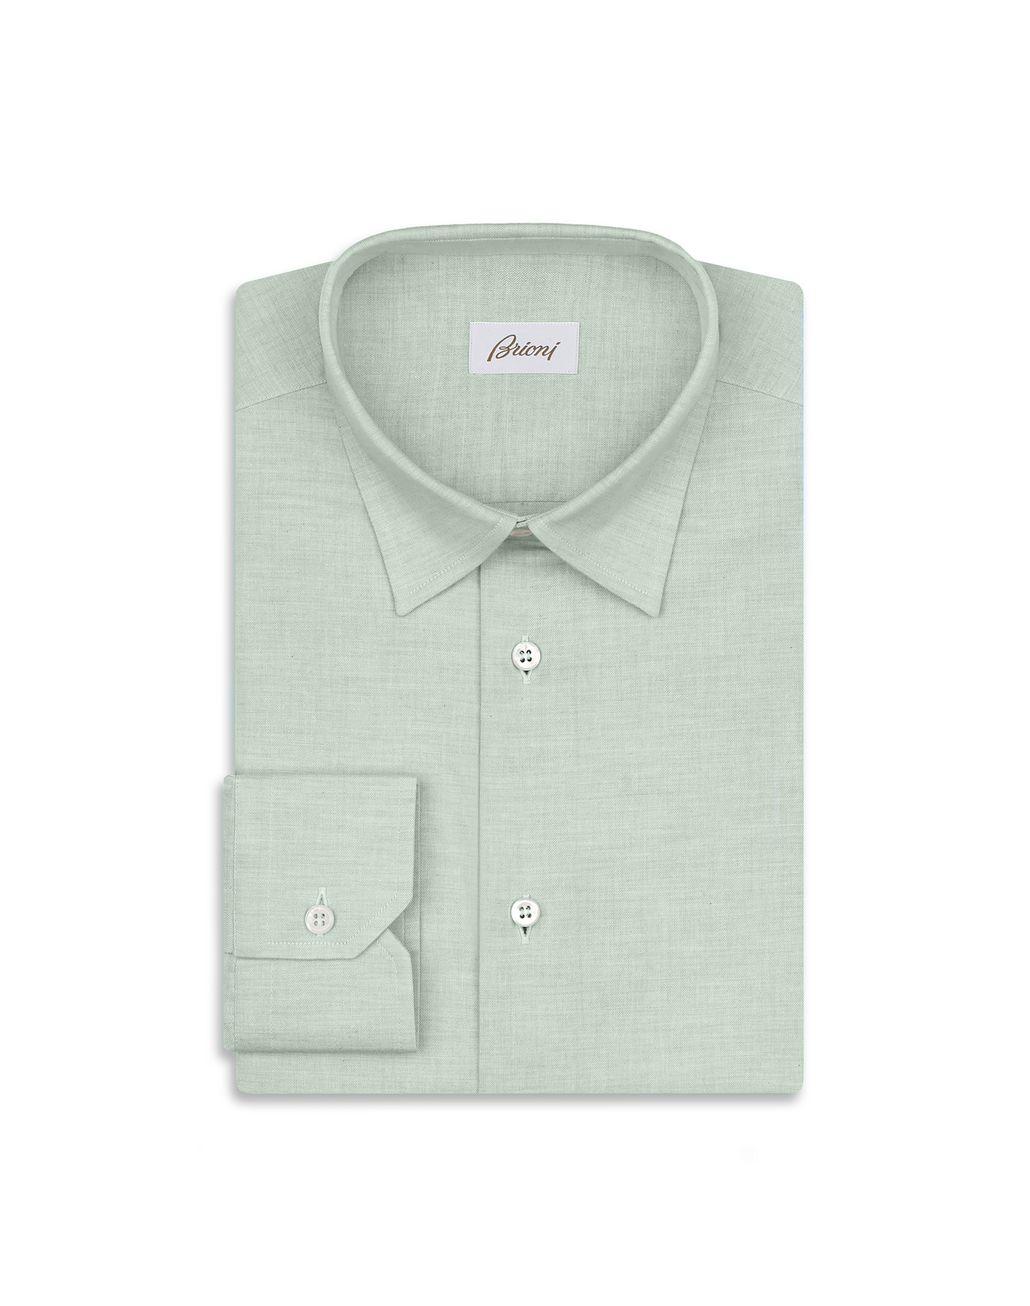 BRIONI Green Cotton Shirt Leisure shirt Man f